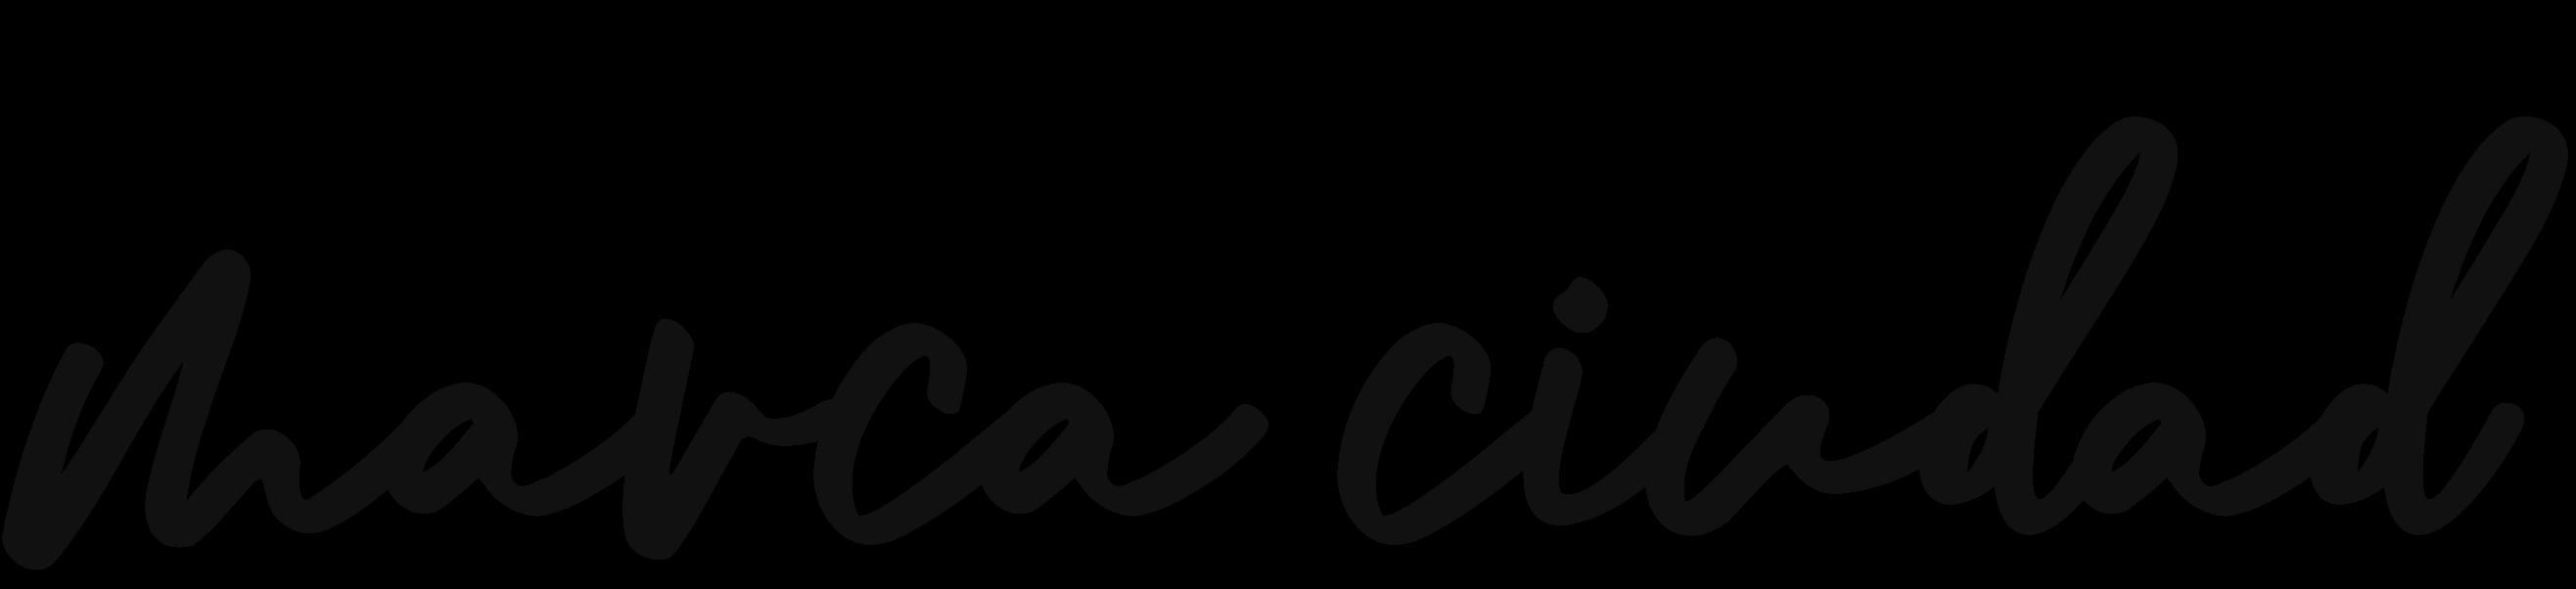 Marca Ciudad Chihuahua